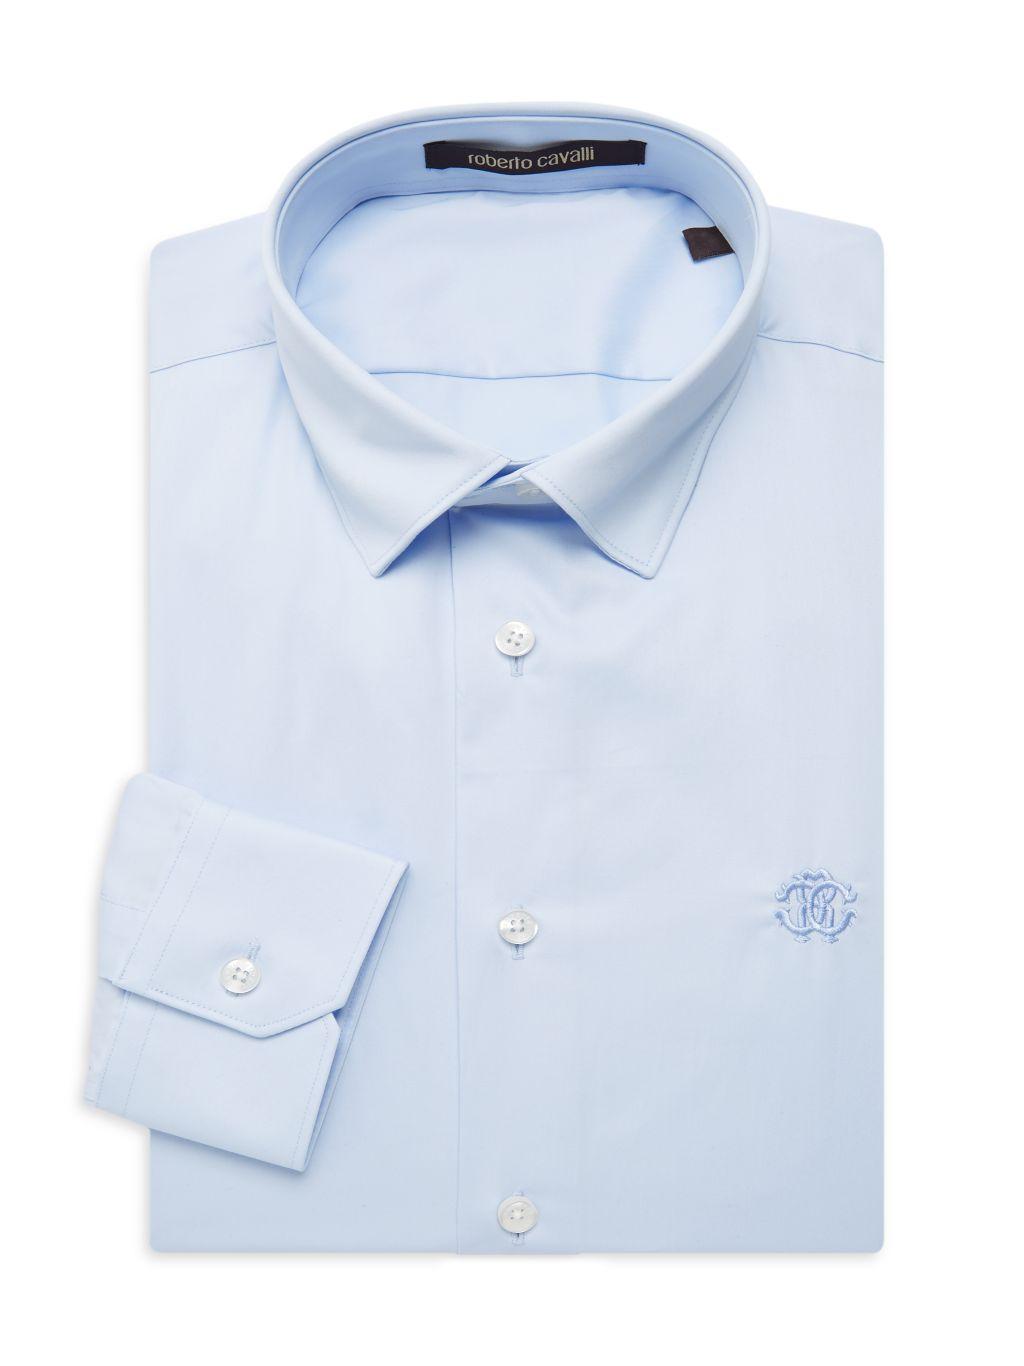 Roberto Cavalli Slim-Fit Dress Shirt